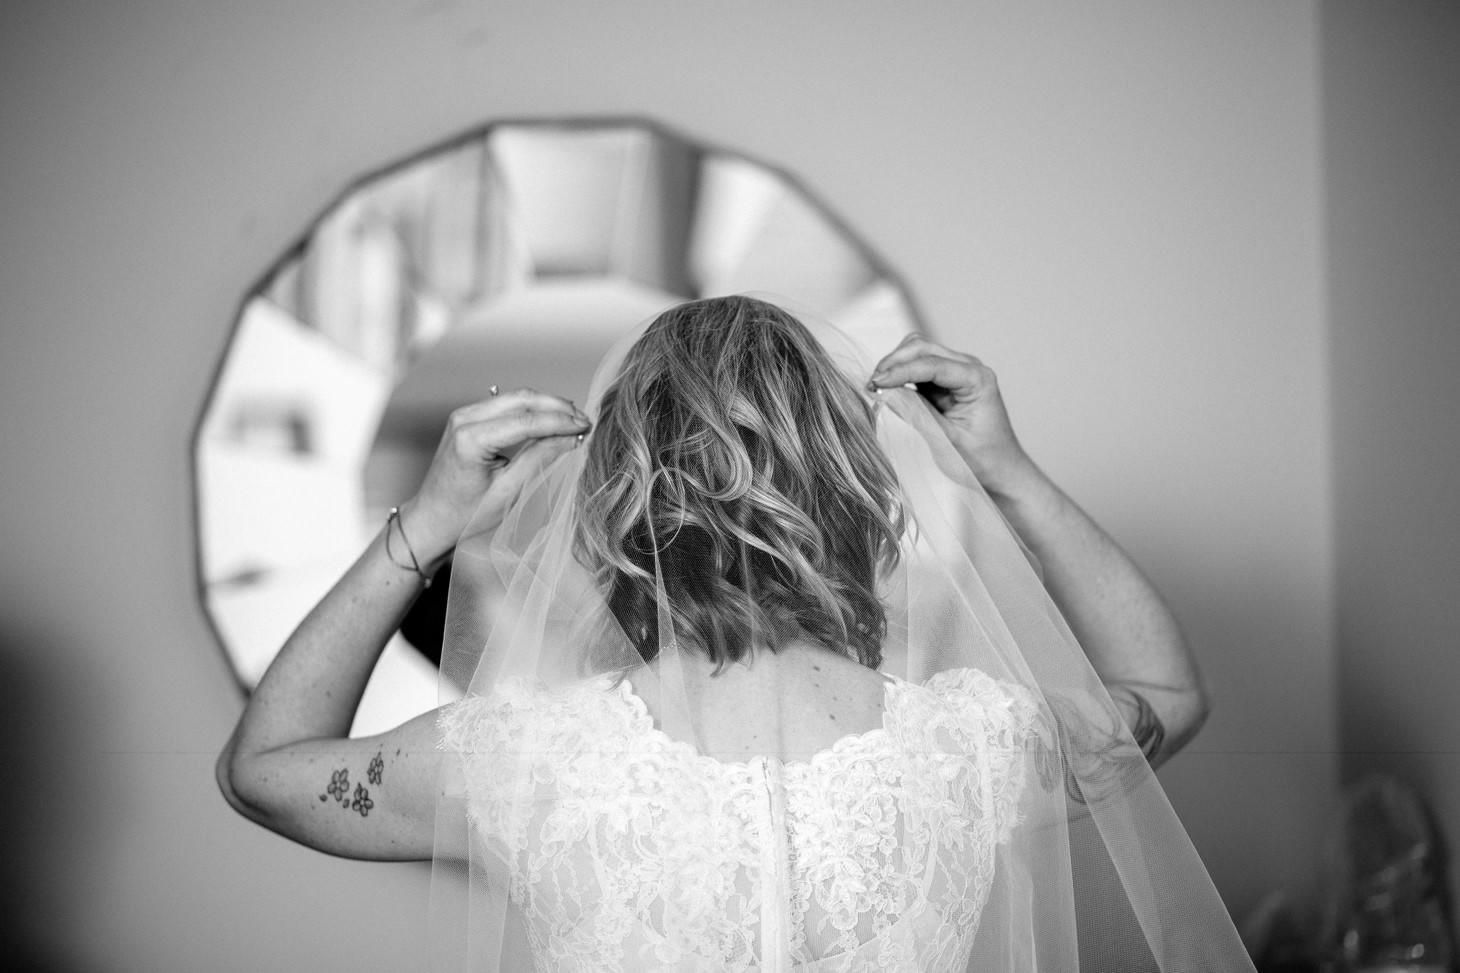 nyc-long-island-wedding-photographer-three-village-inn-smitten-chickens09.jpg